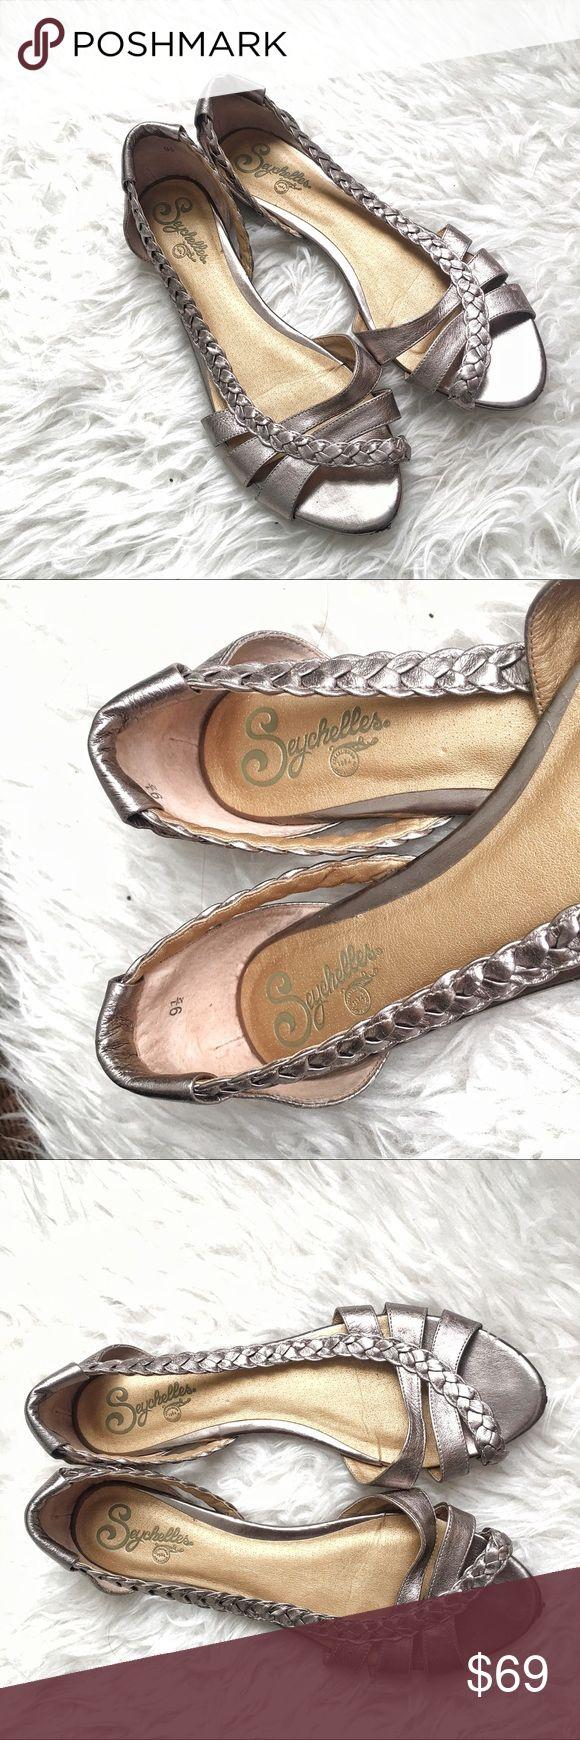 Seychelles leather braided sandals Excellent condition Seychelles Shoes Sandals